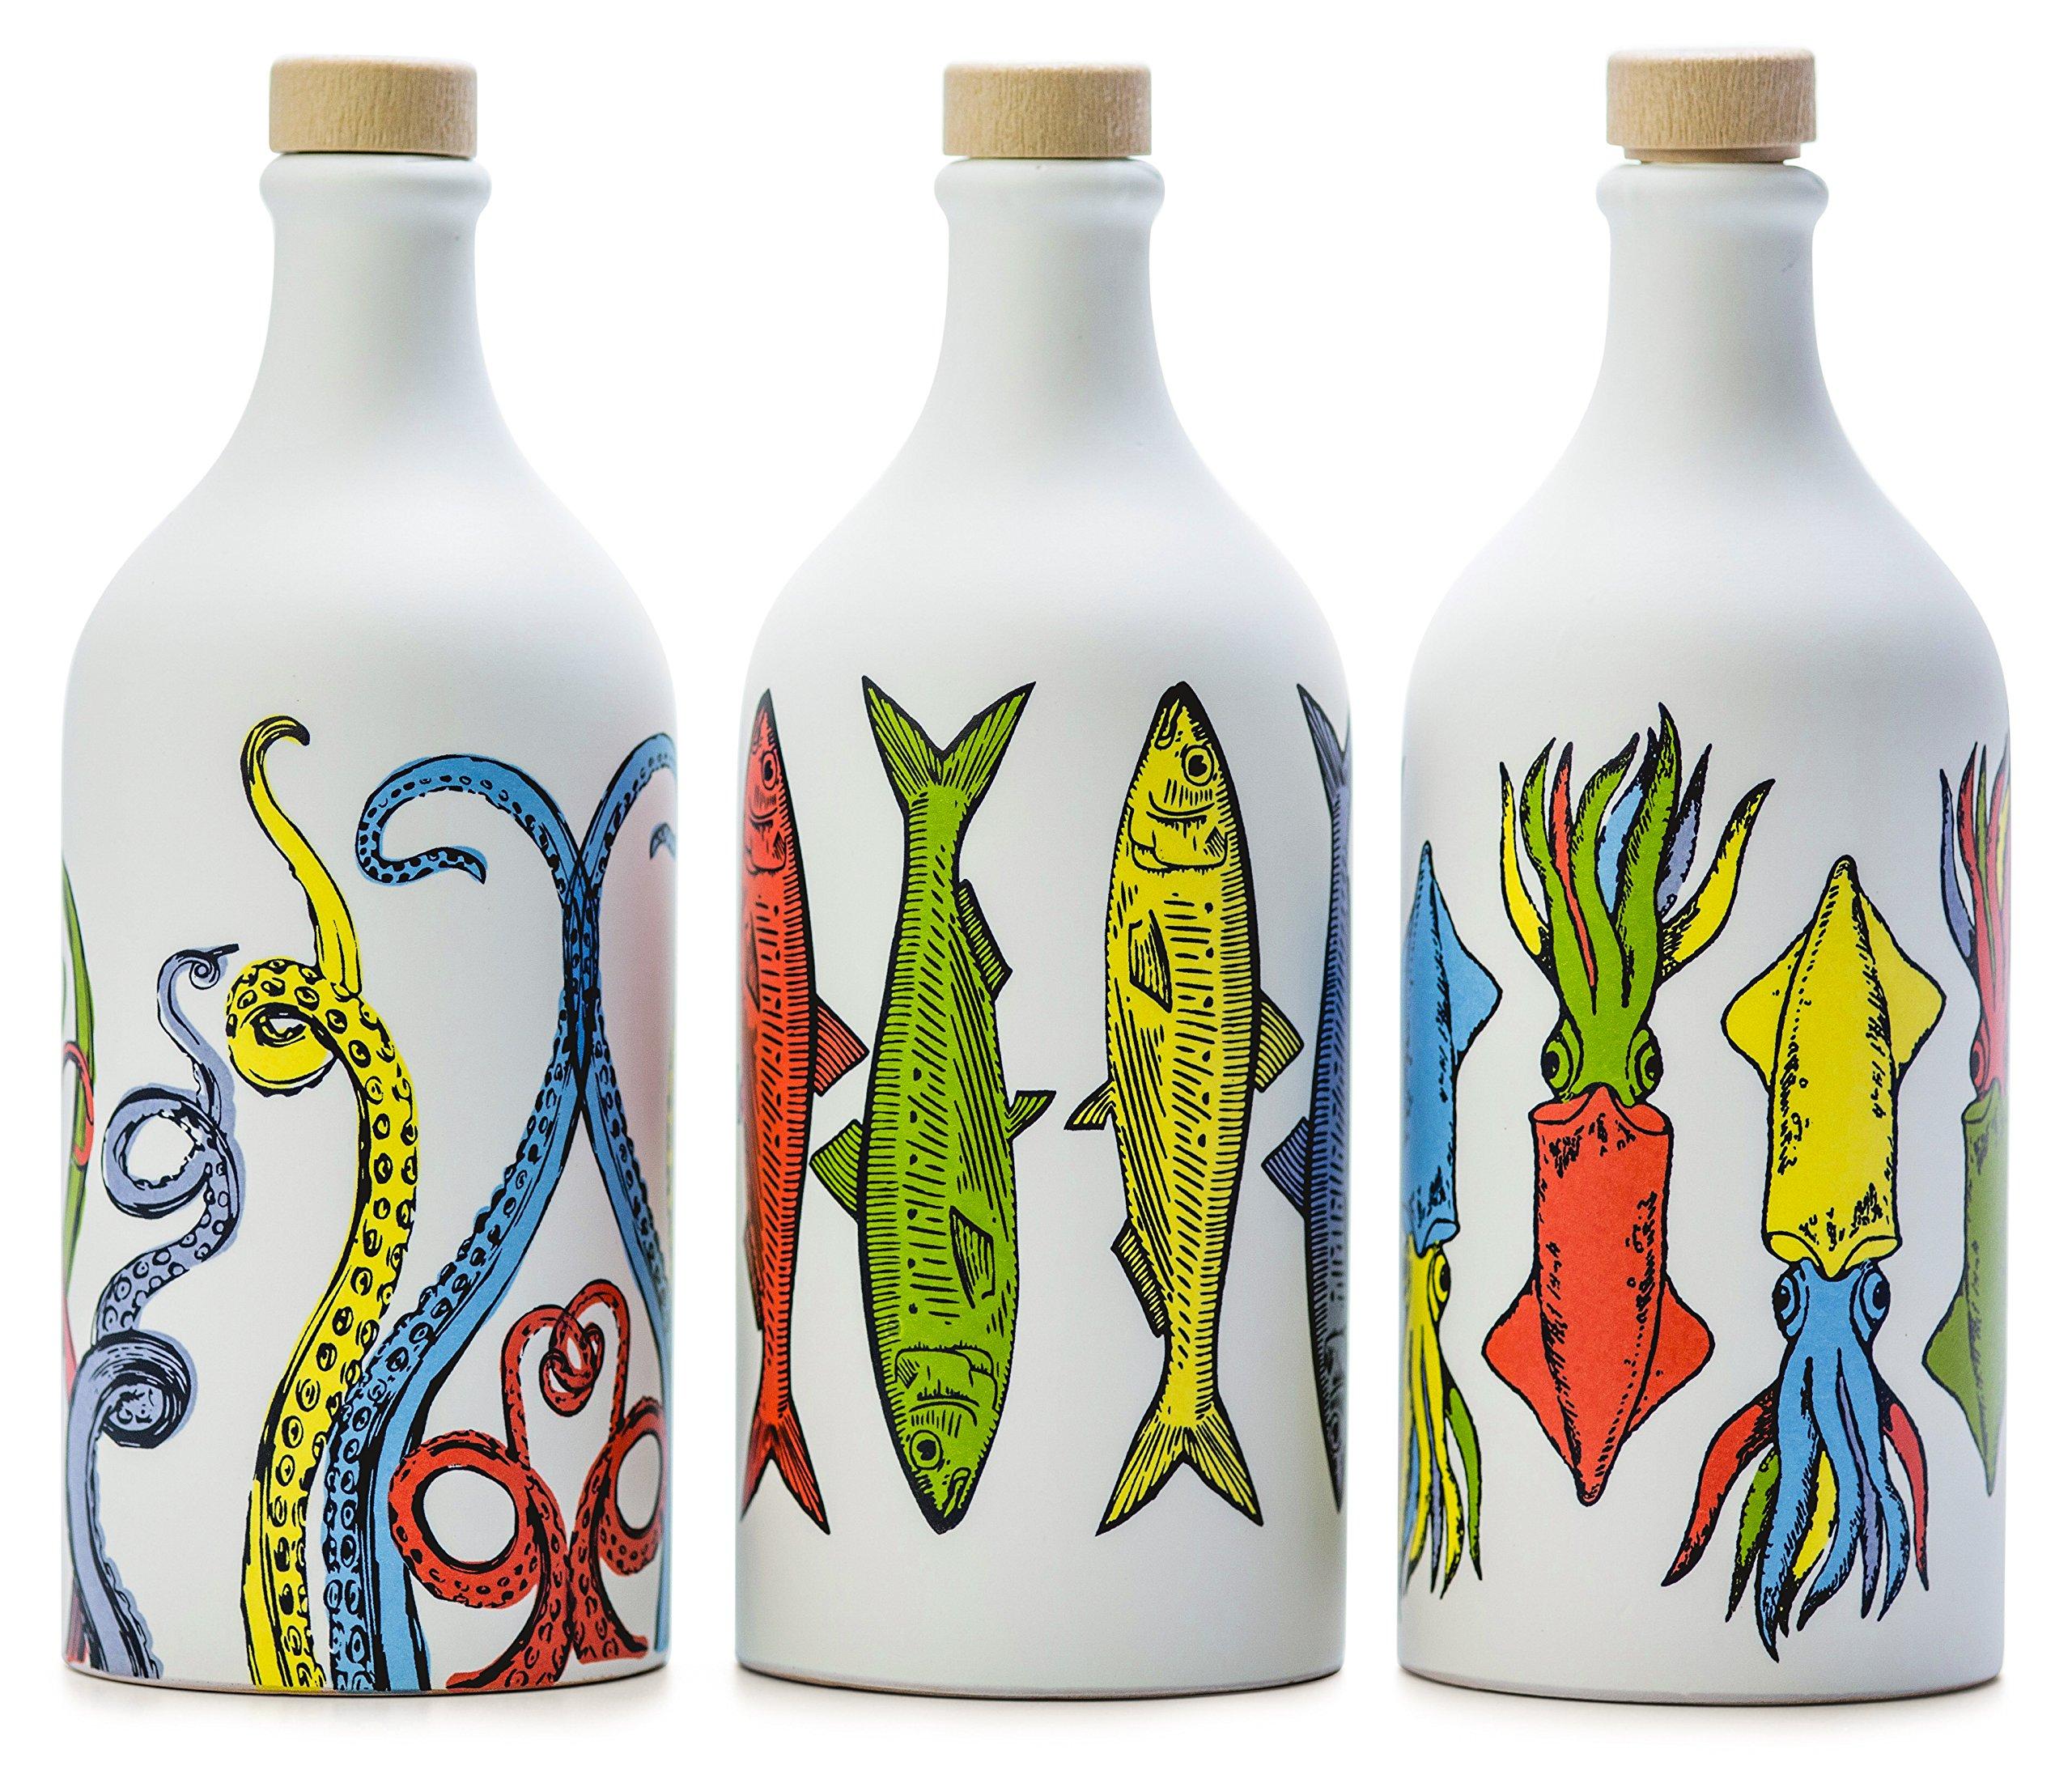 Antico Frantoio Muraglia, Premium Italian Extra Virgin Olive Oil, Pop Art Collection Set of 3: Tentacles, Sardines and Cuttlefish, Collectible Handmade Ceramic Bottles 17 Fl.oz Best Foodie Gift